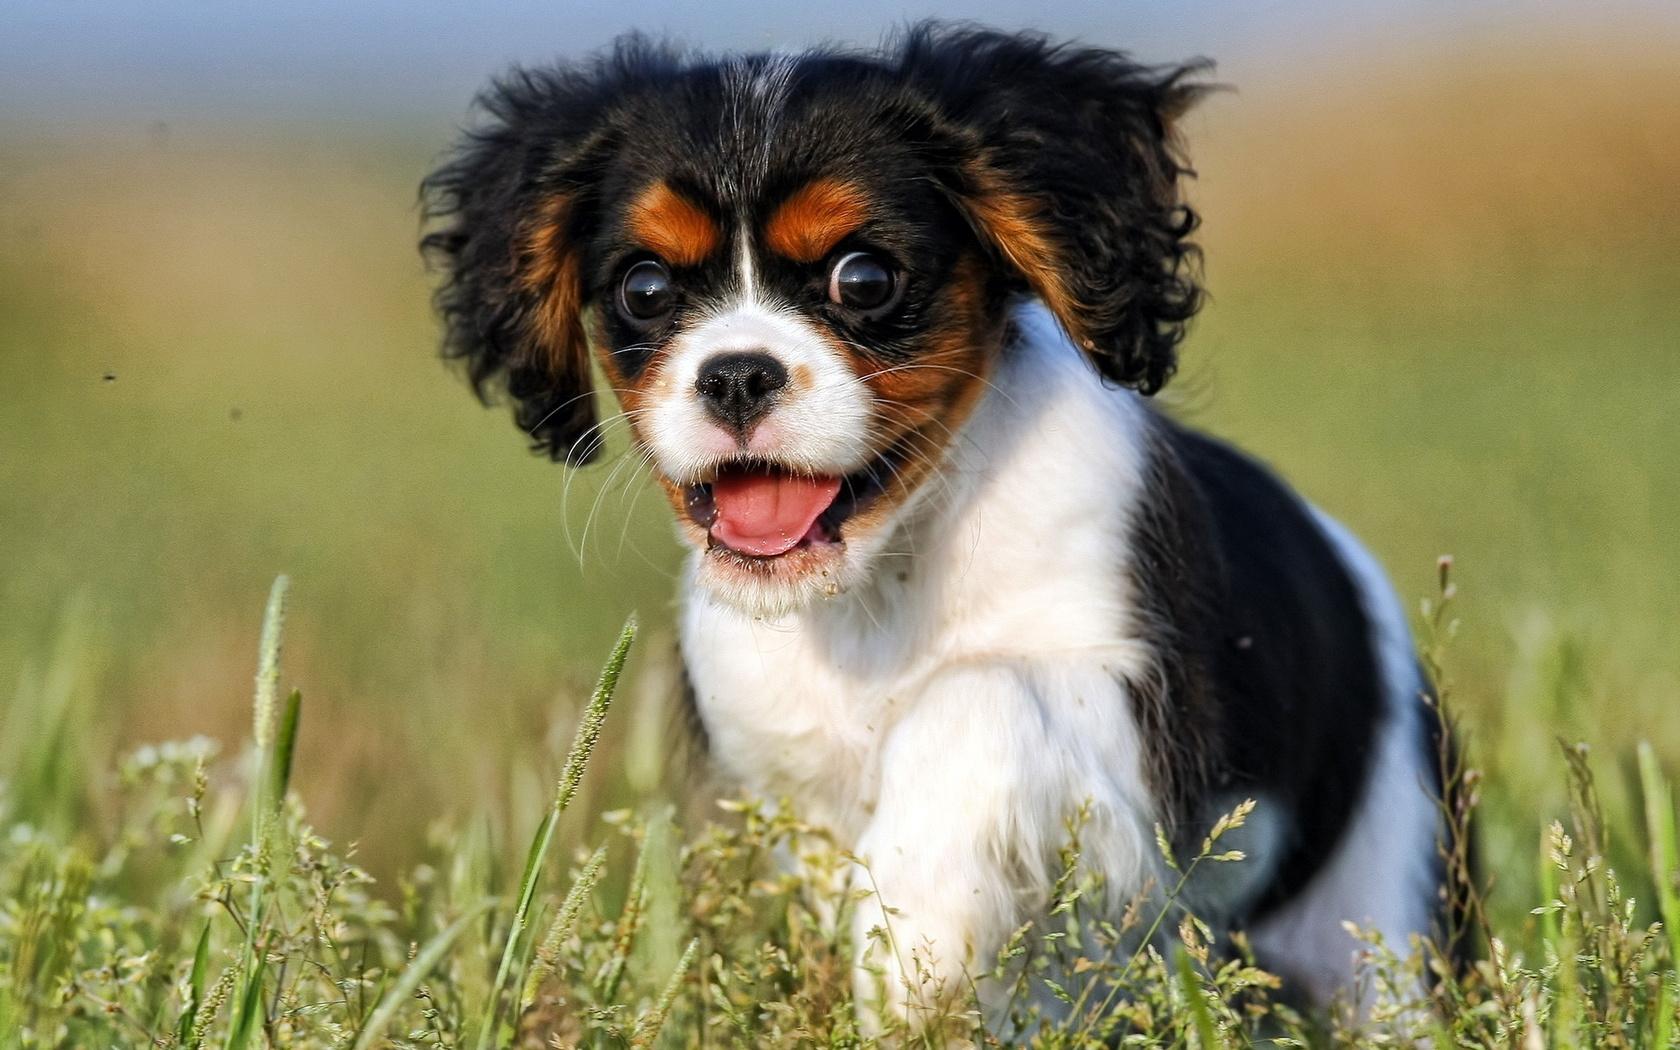 Картинки про собак, доброго утра удачного